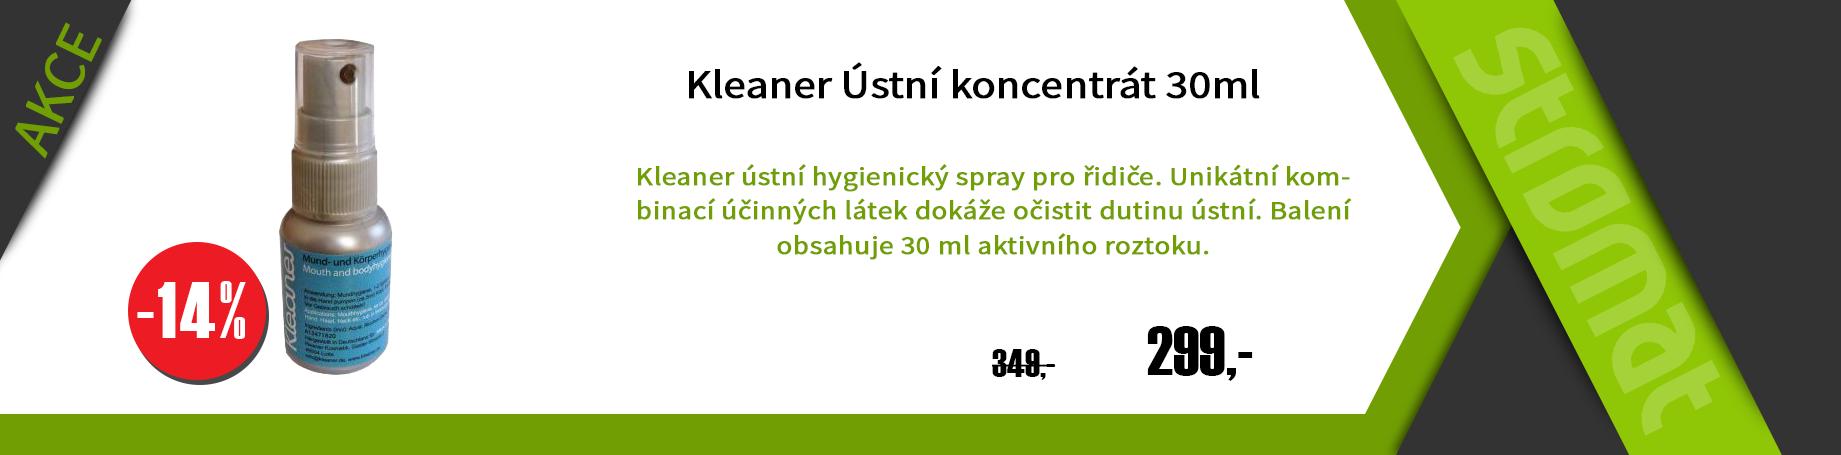 Kleaner Ústní koncentrát 30ml